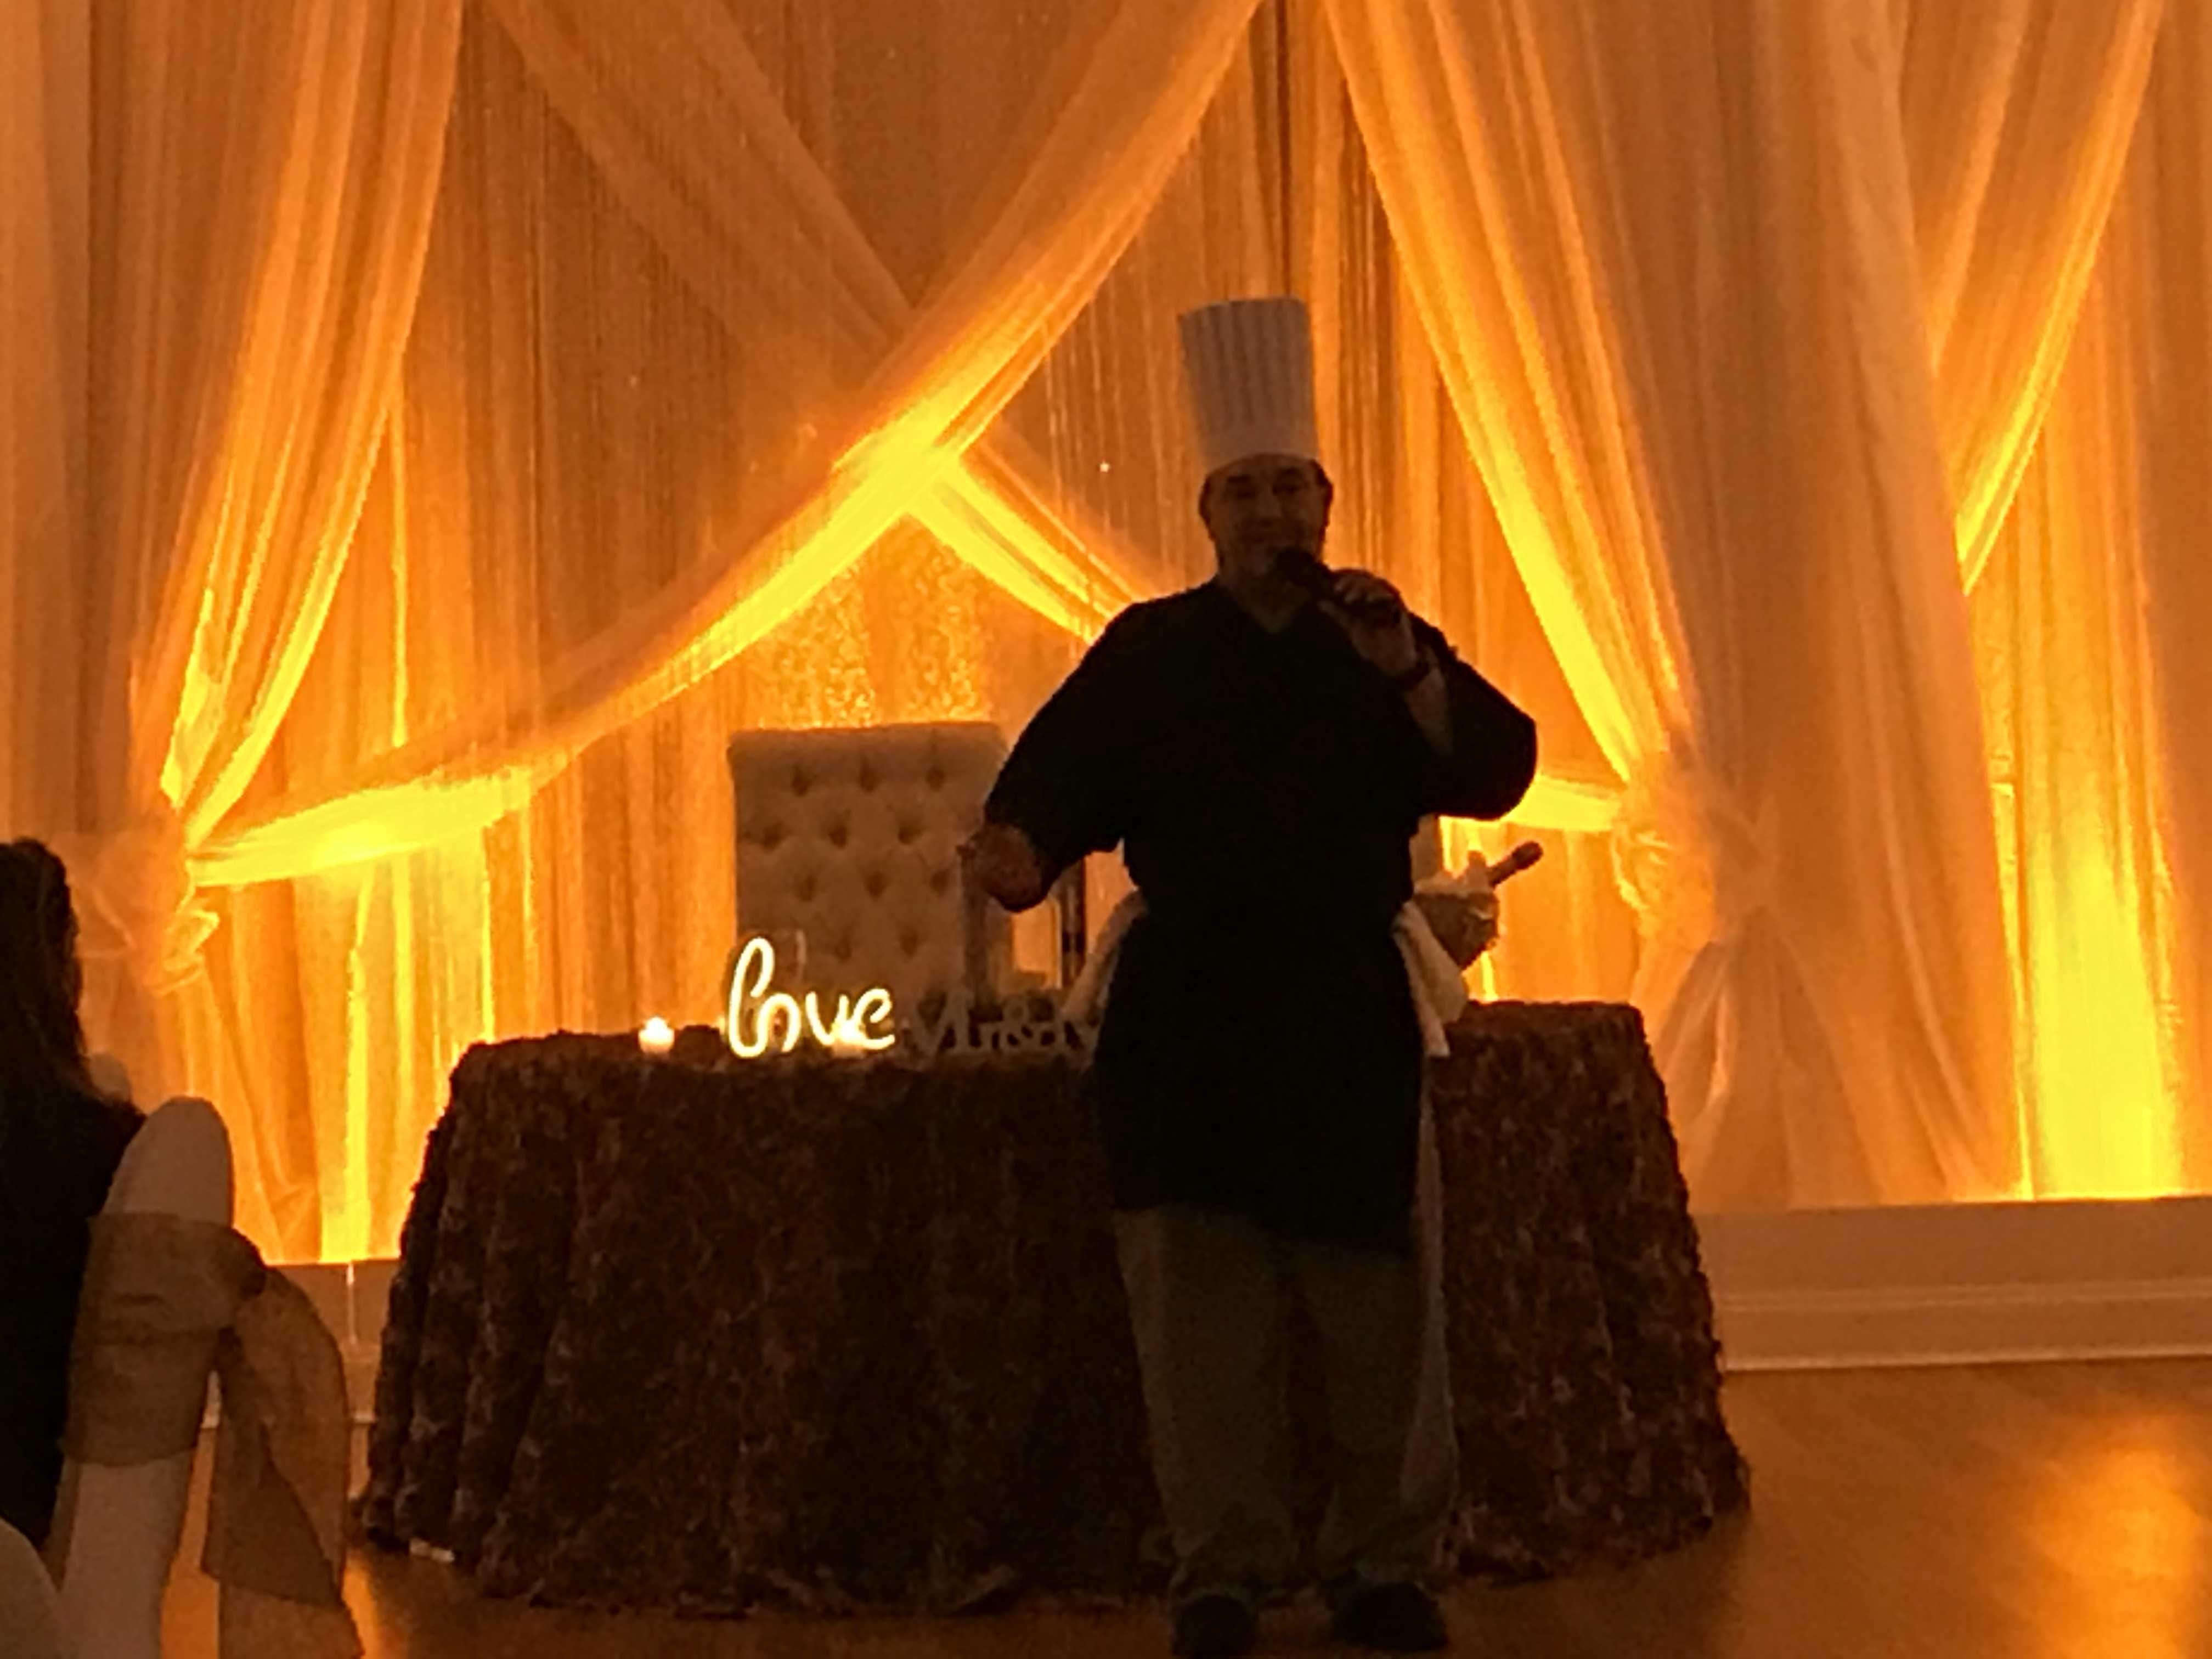 Wedding Venue Grand Manor In Melbourne Fl Executive Chef Anthony Elias Renaissance Catering Uplightin Wedding Catering Wedding Draping Florida Wedding